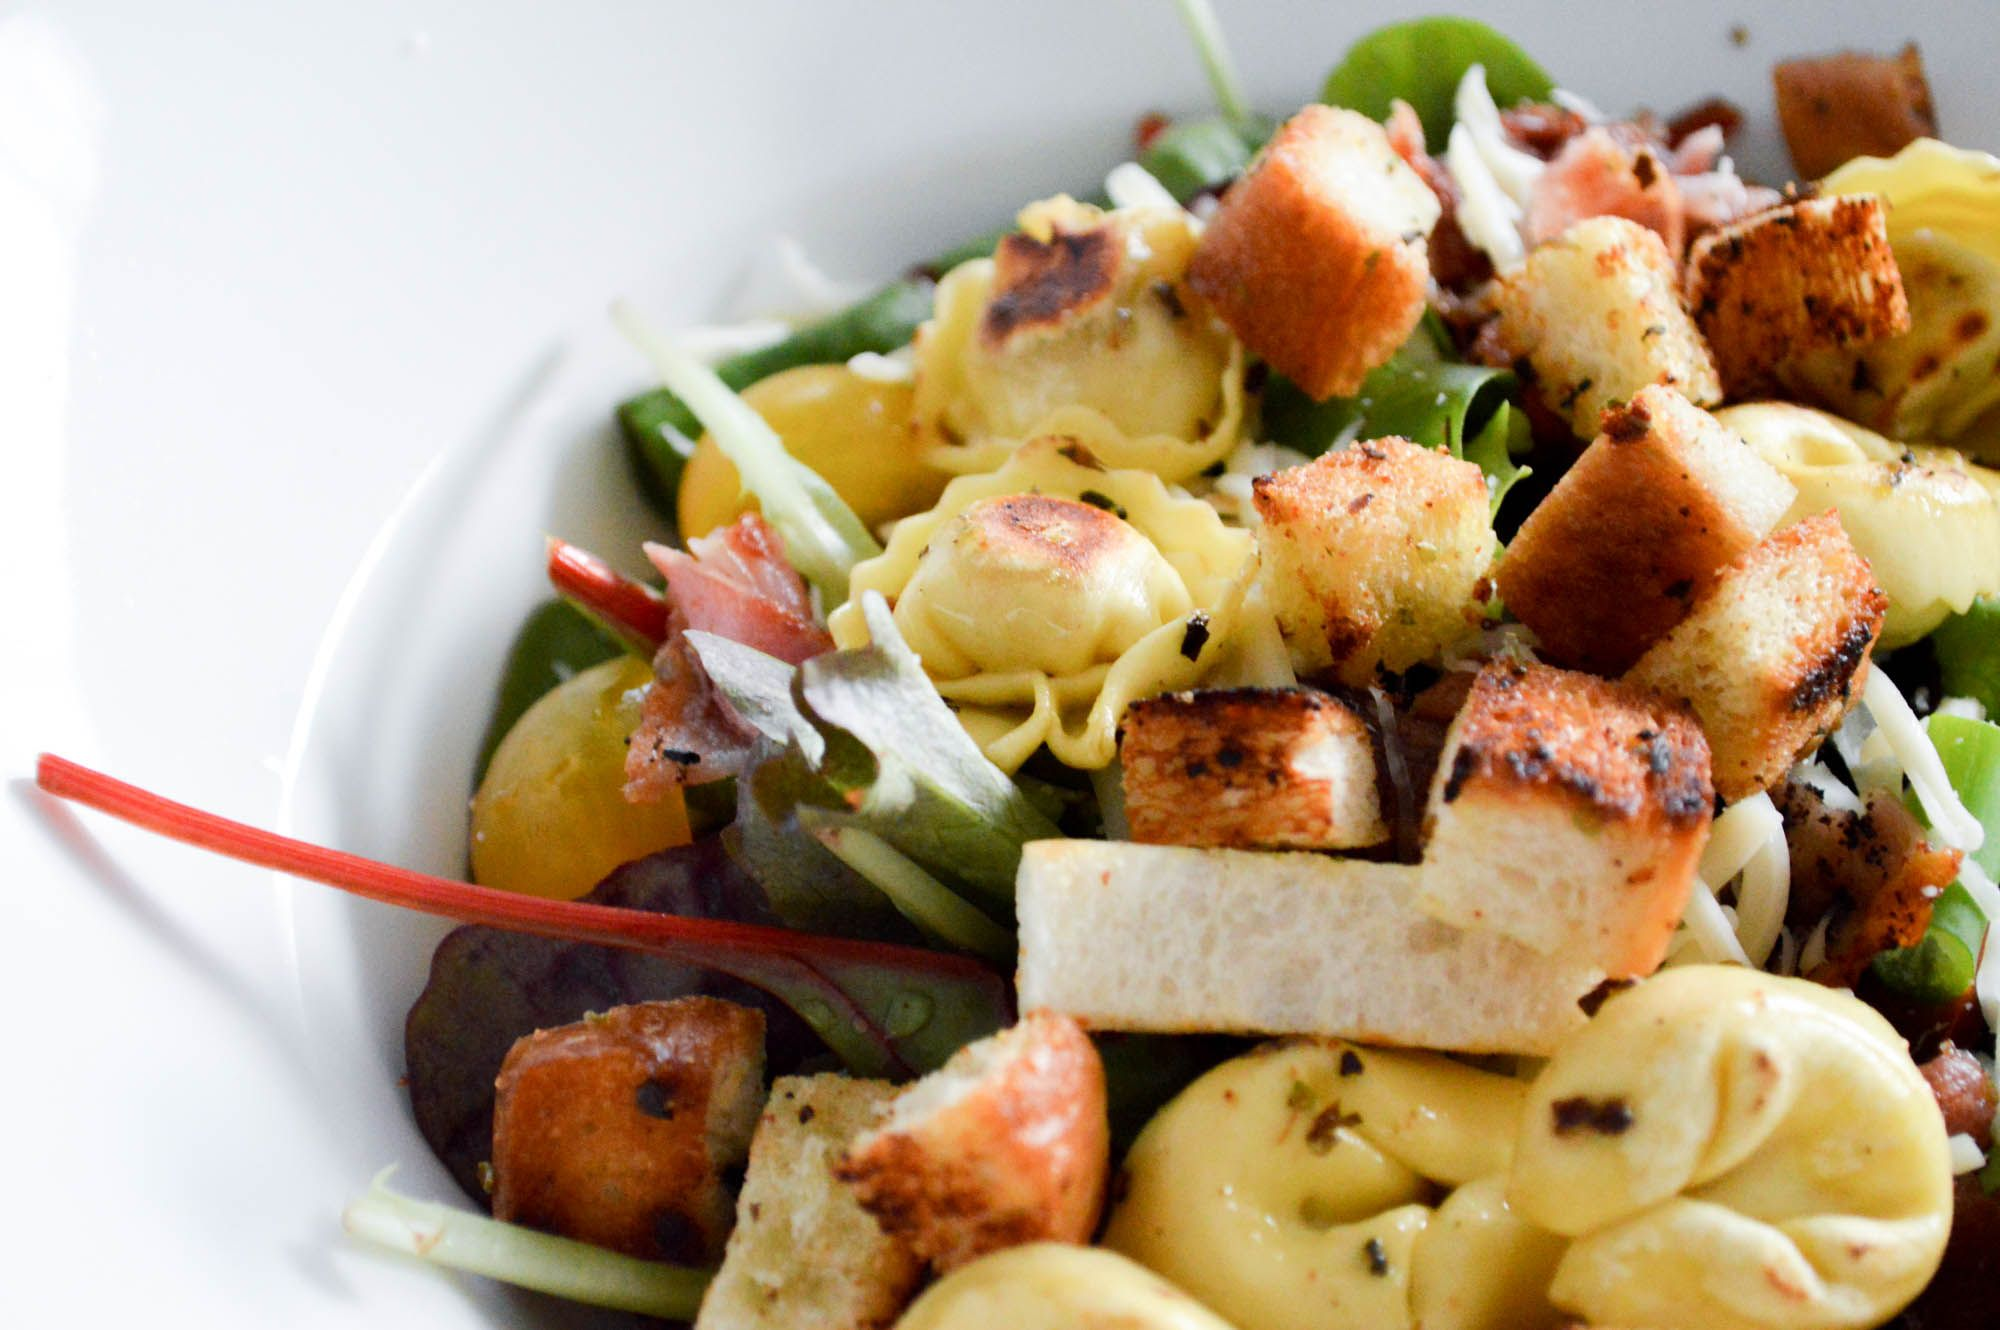 Bunter Salat mit Tortellini